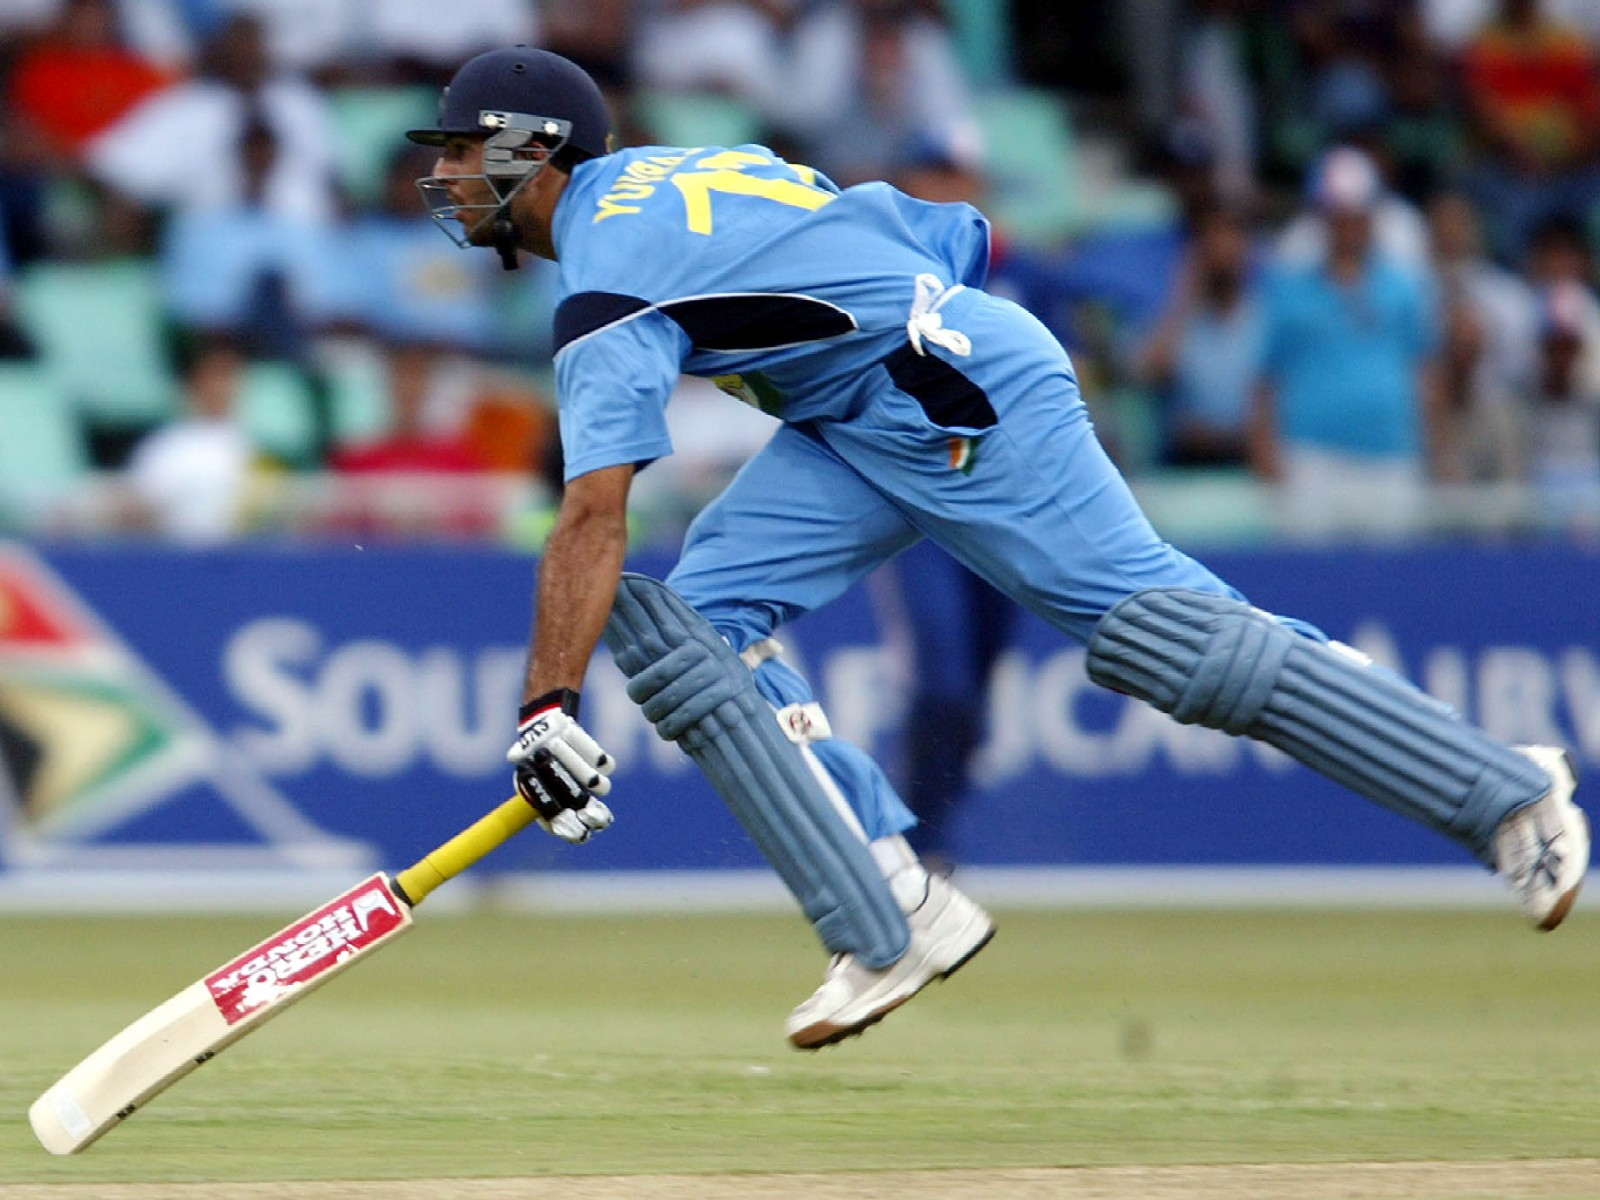 http://4.bp.blogspot.com/-Hs0FPFrkW18/TzJBZyDeeYI/AAAAAAAAOL8/_PLwthh0ja0/s1600/cricket_1.jpg